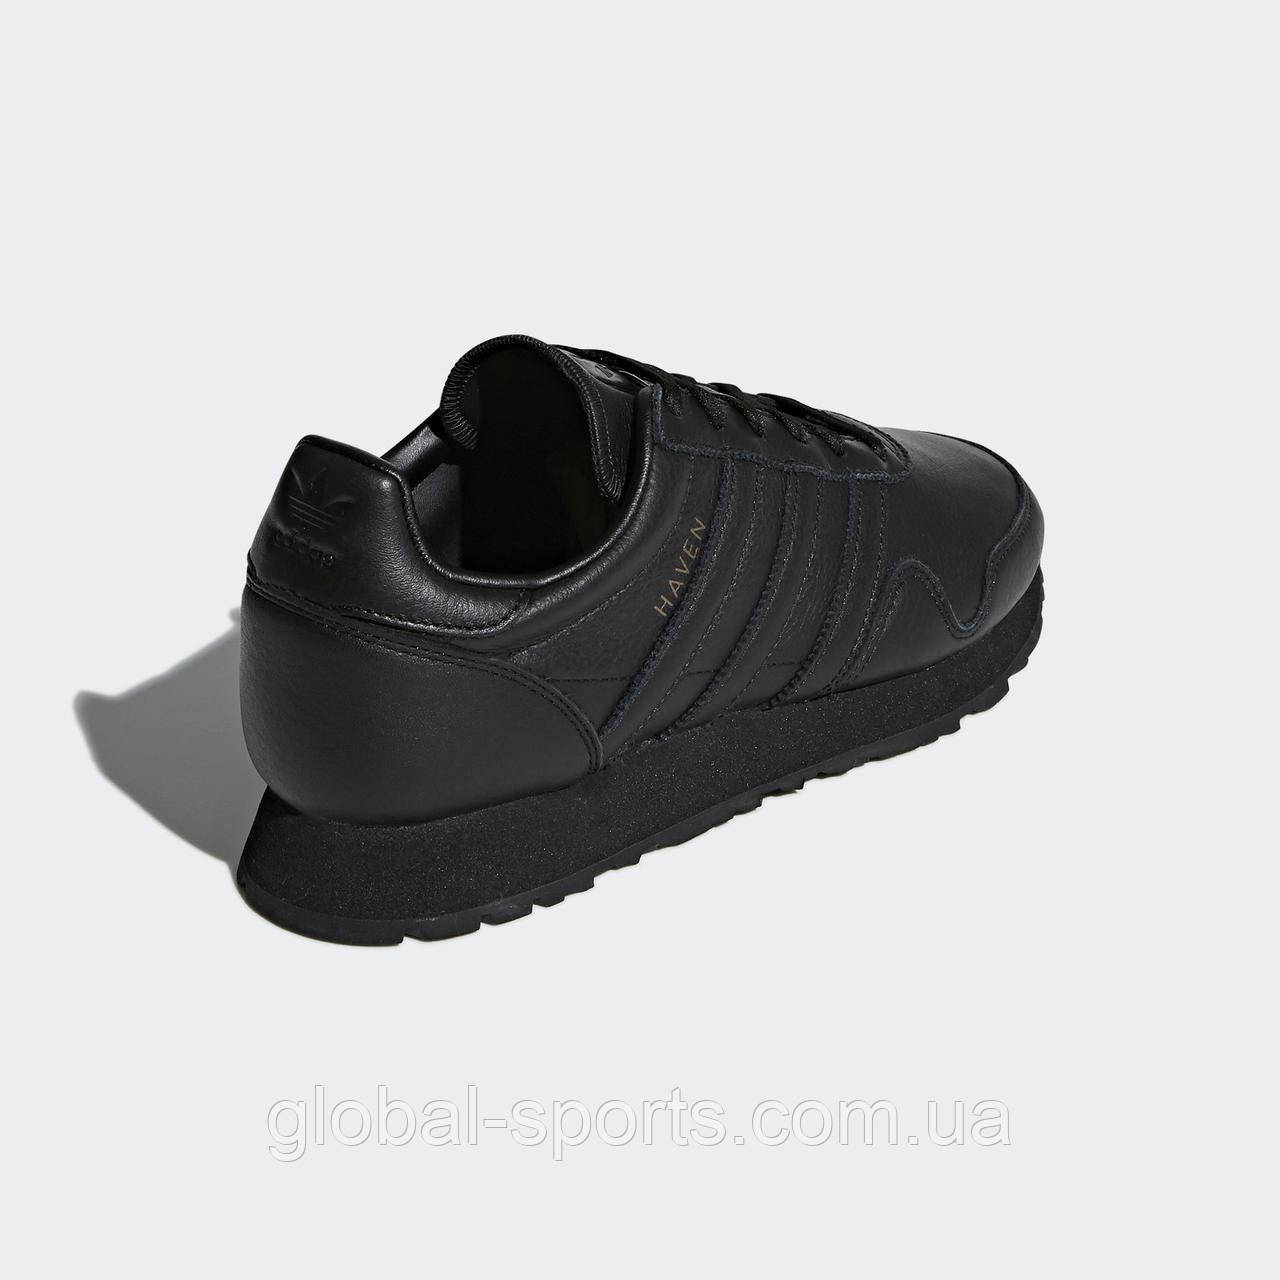 6fee6738e Мужские кроссовки Adidas Originals HAVEN (Артикул: CQ3036): продажа ...